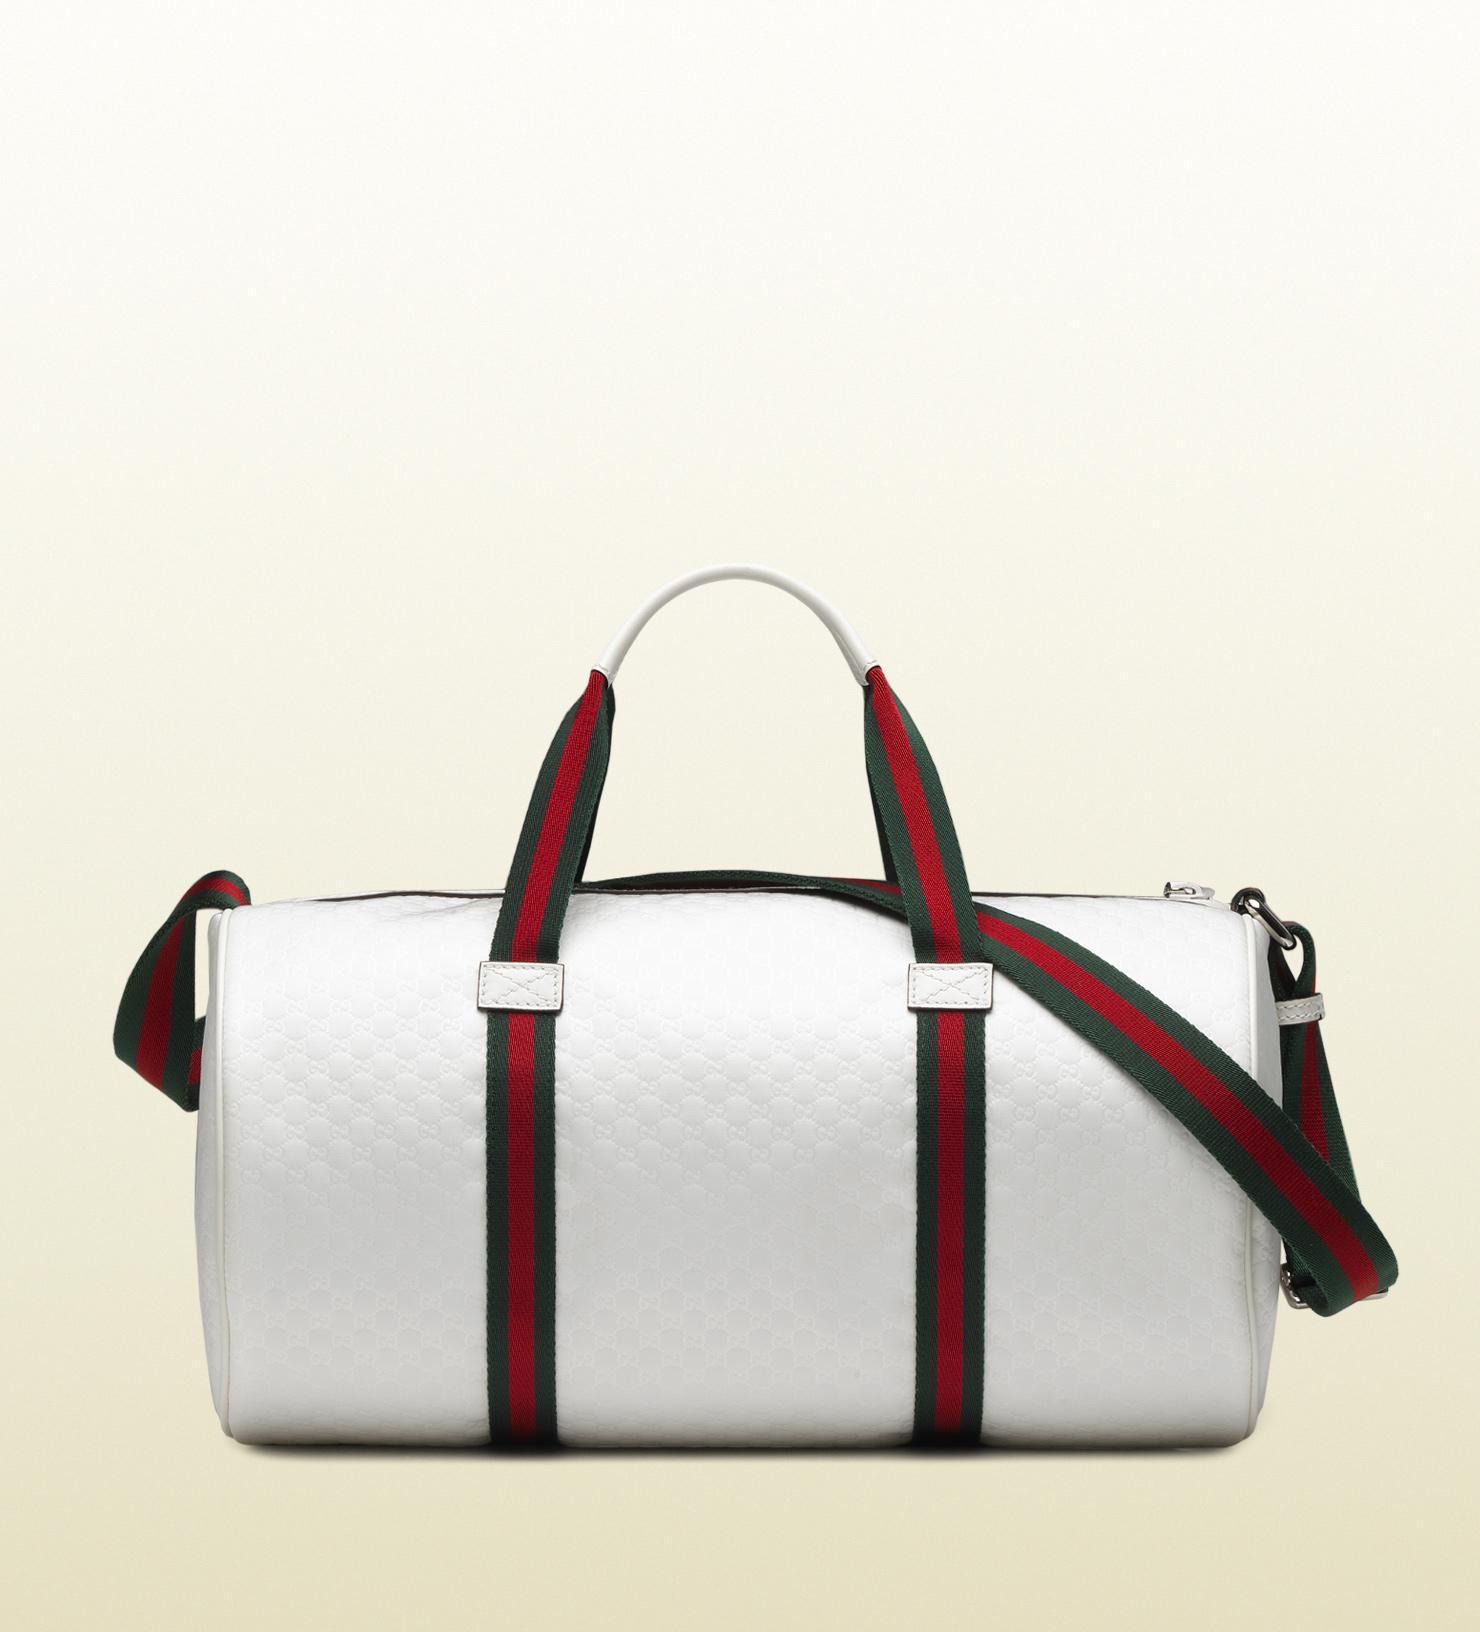 85b6cdfab285 Gucci White Micro Gg Nylon Gym Bag in White for Men - Lyst